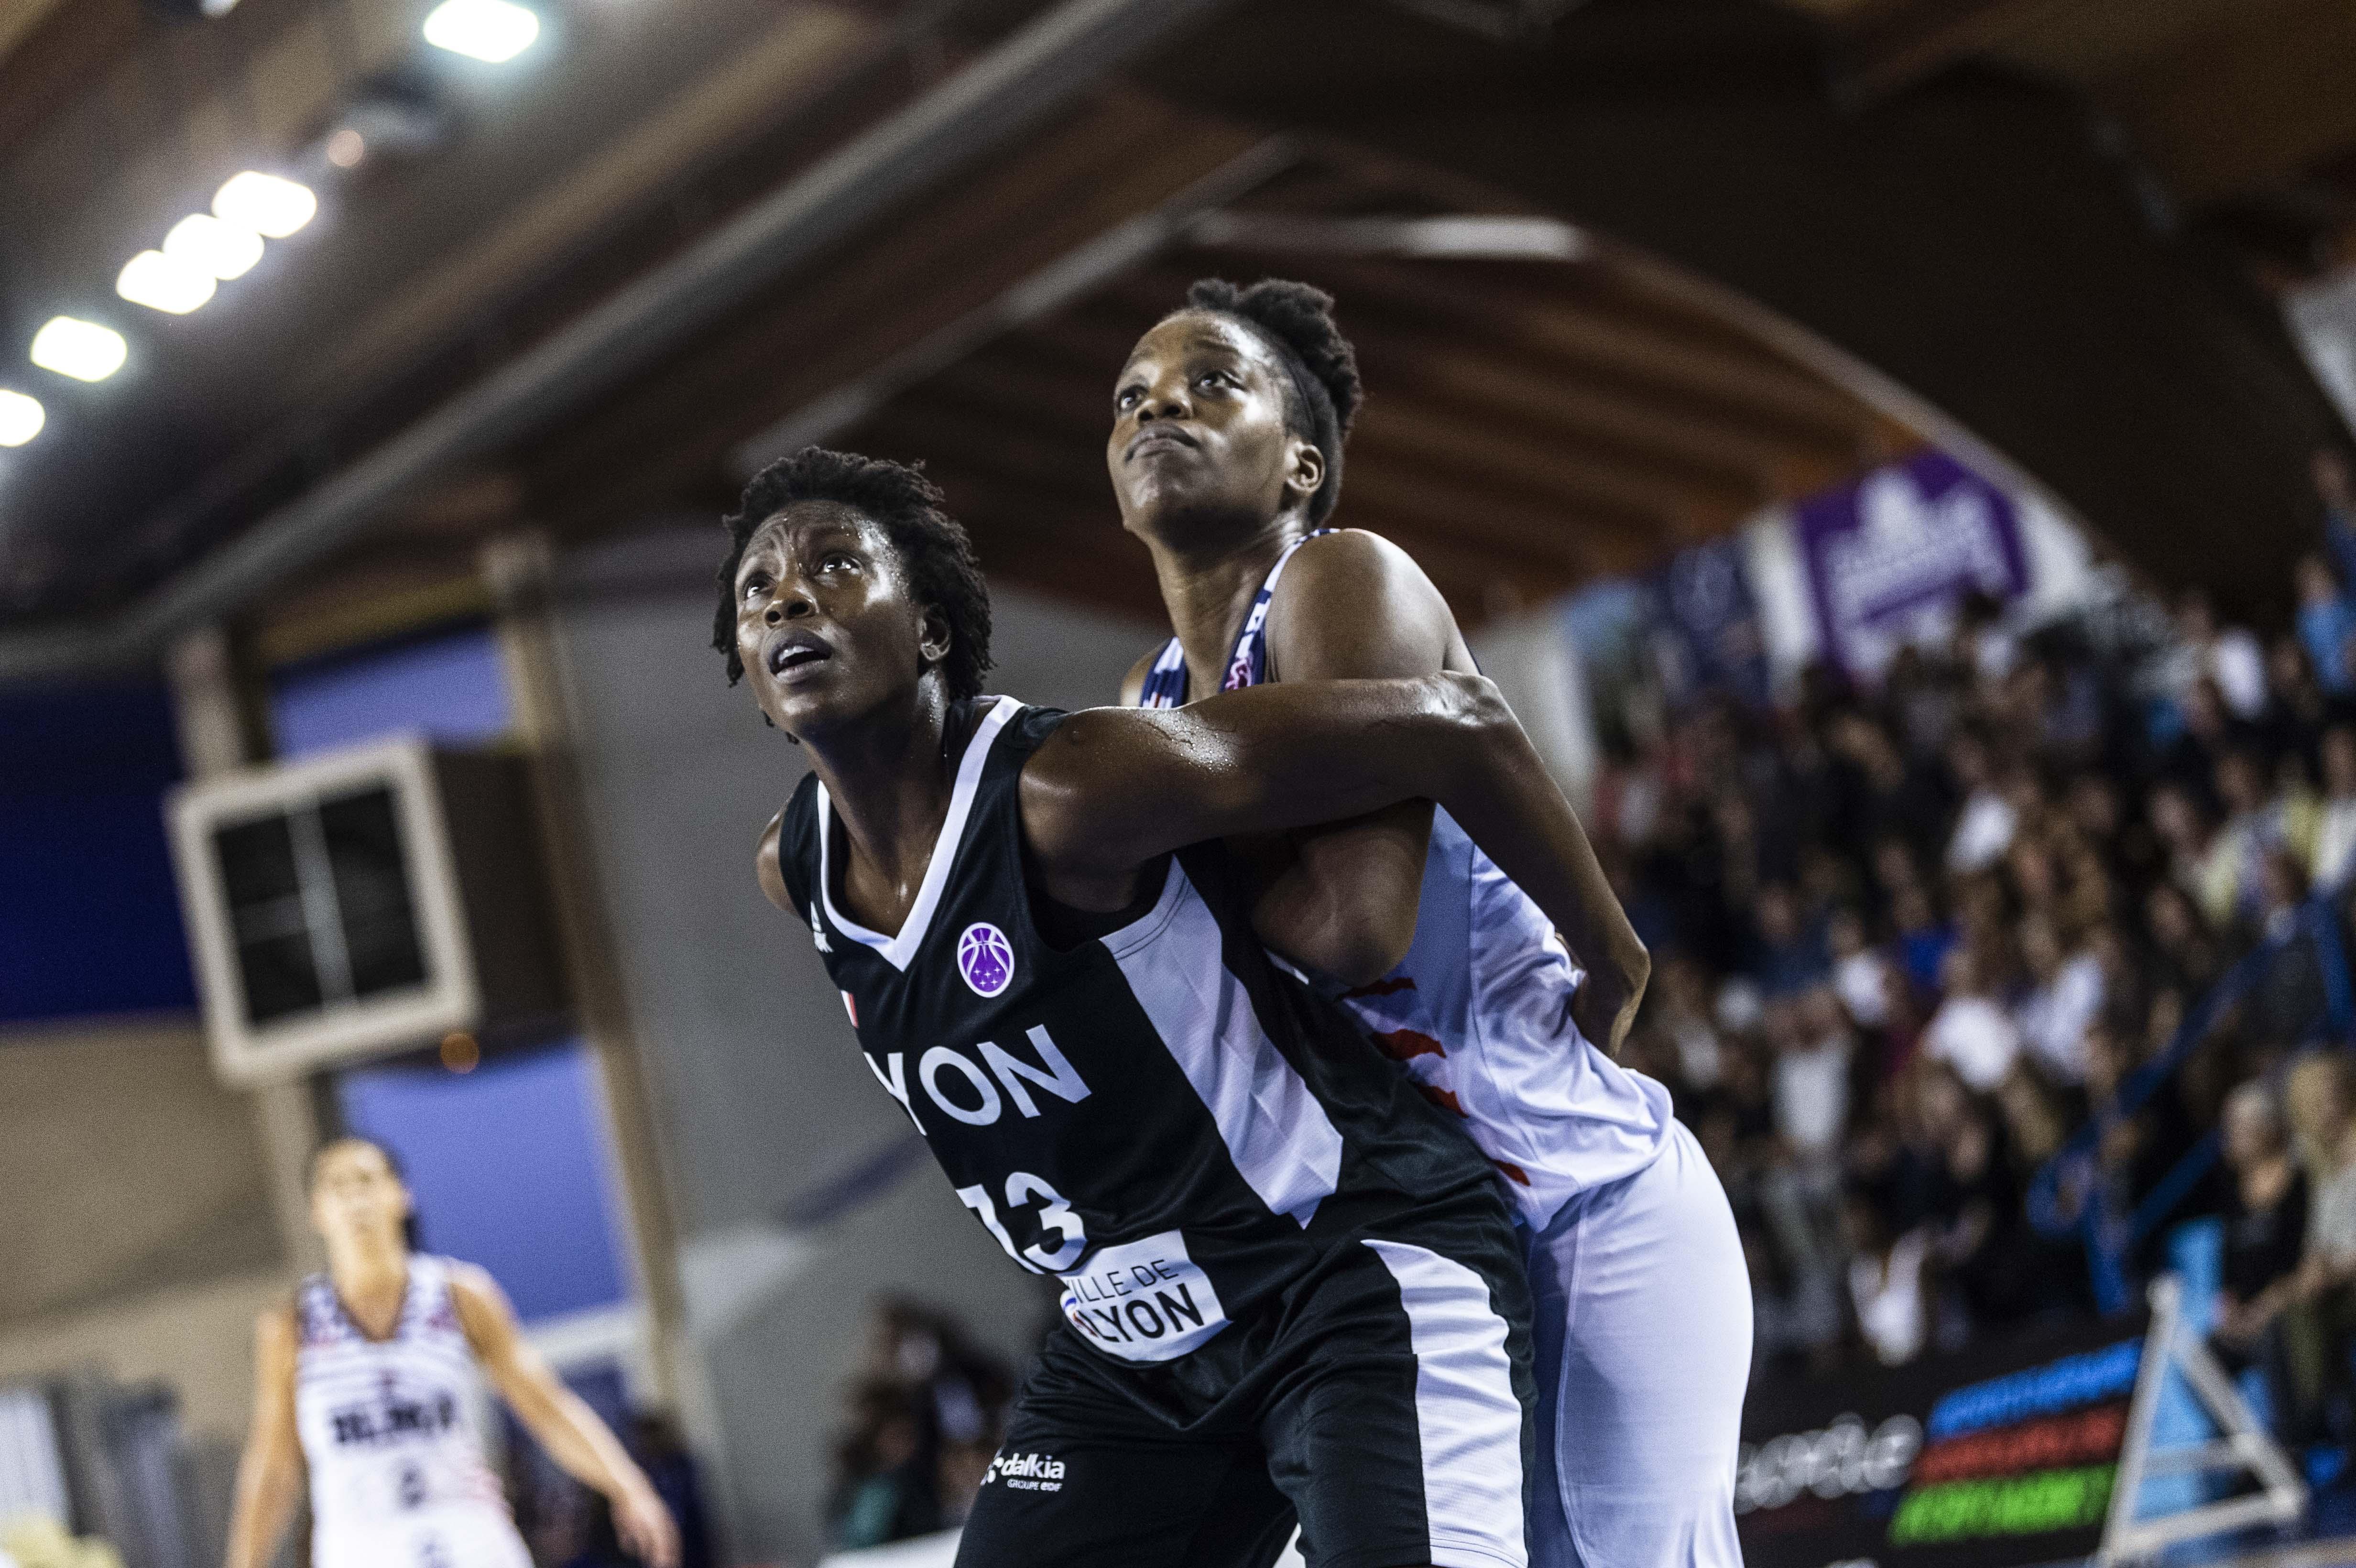 Reprise de l'EuroCup Women Lyon ASVEL Féminin